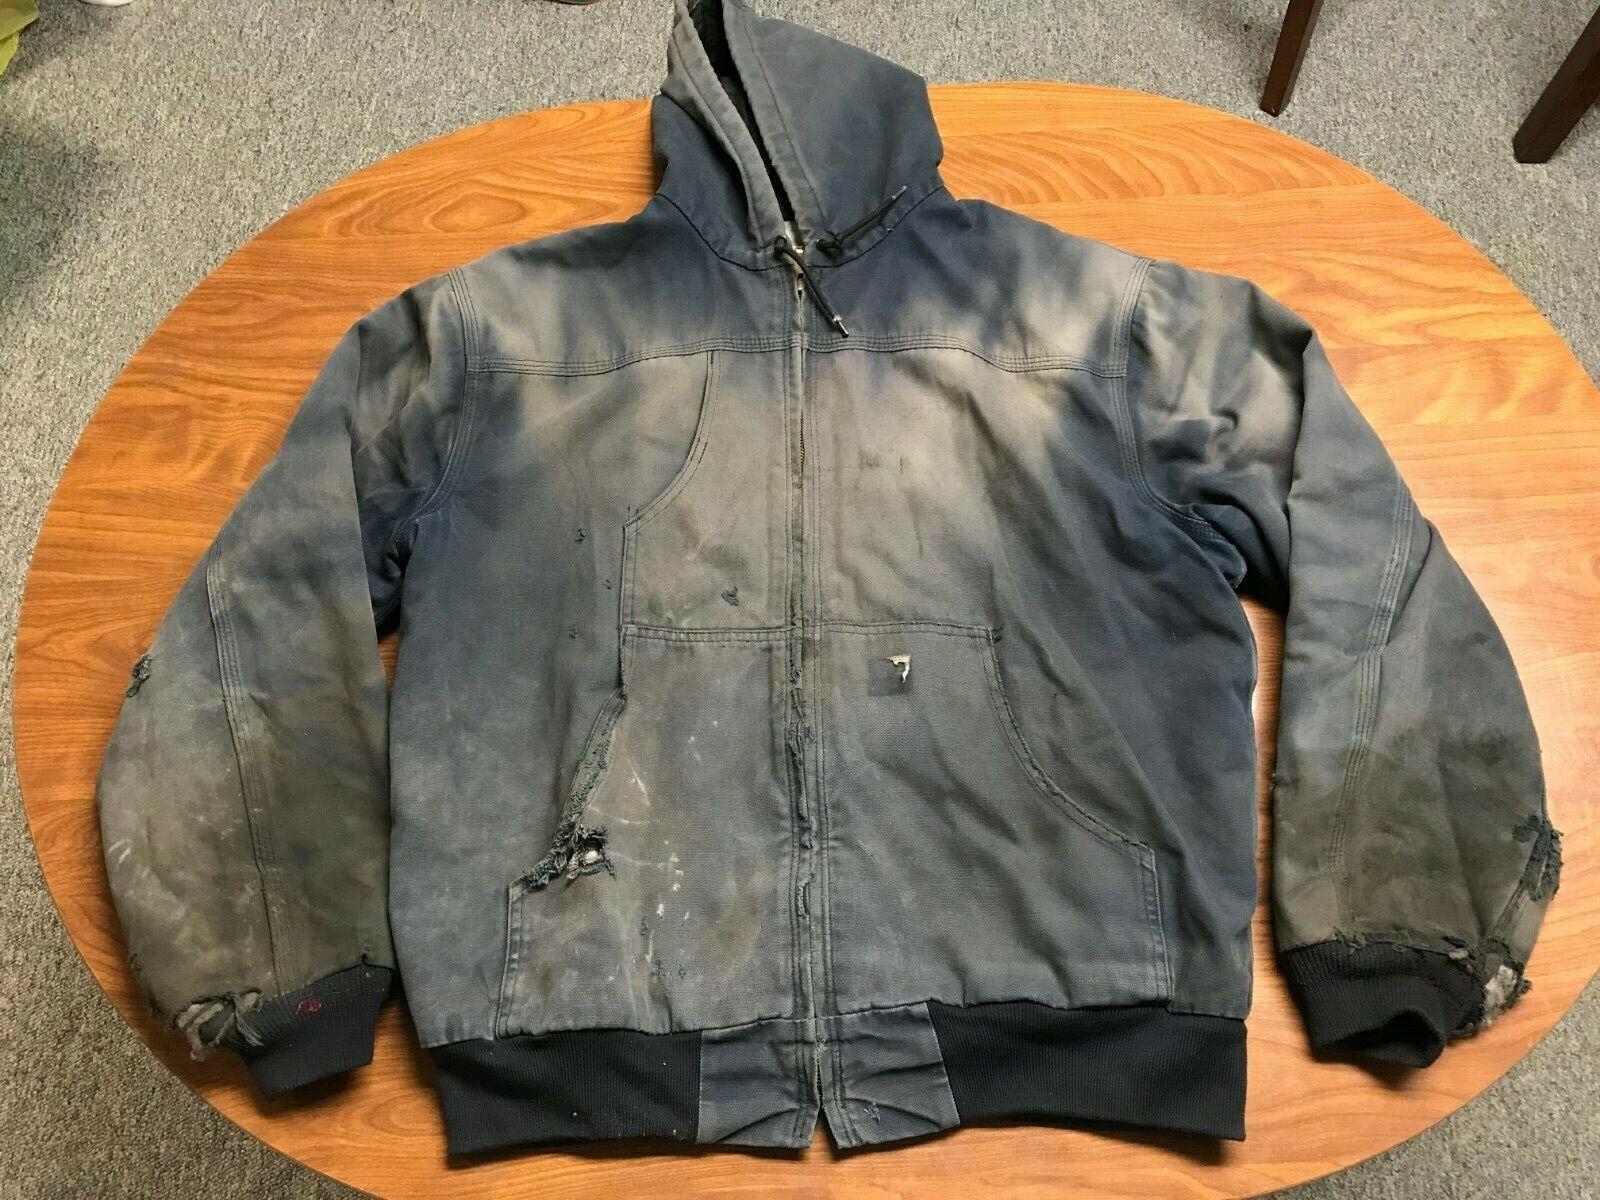 MENS DISTRESSED CARHARTT NAVY BLUE FULL ZIP CANVAS HOODED WORK JACKET SIZE XL - $15.50